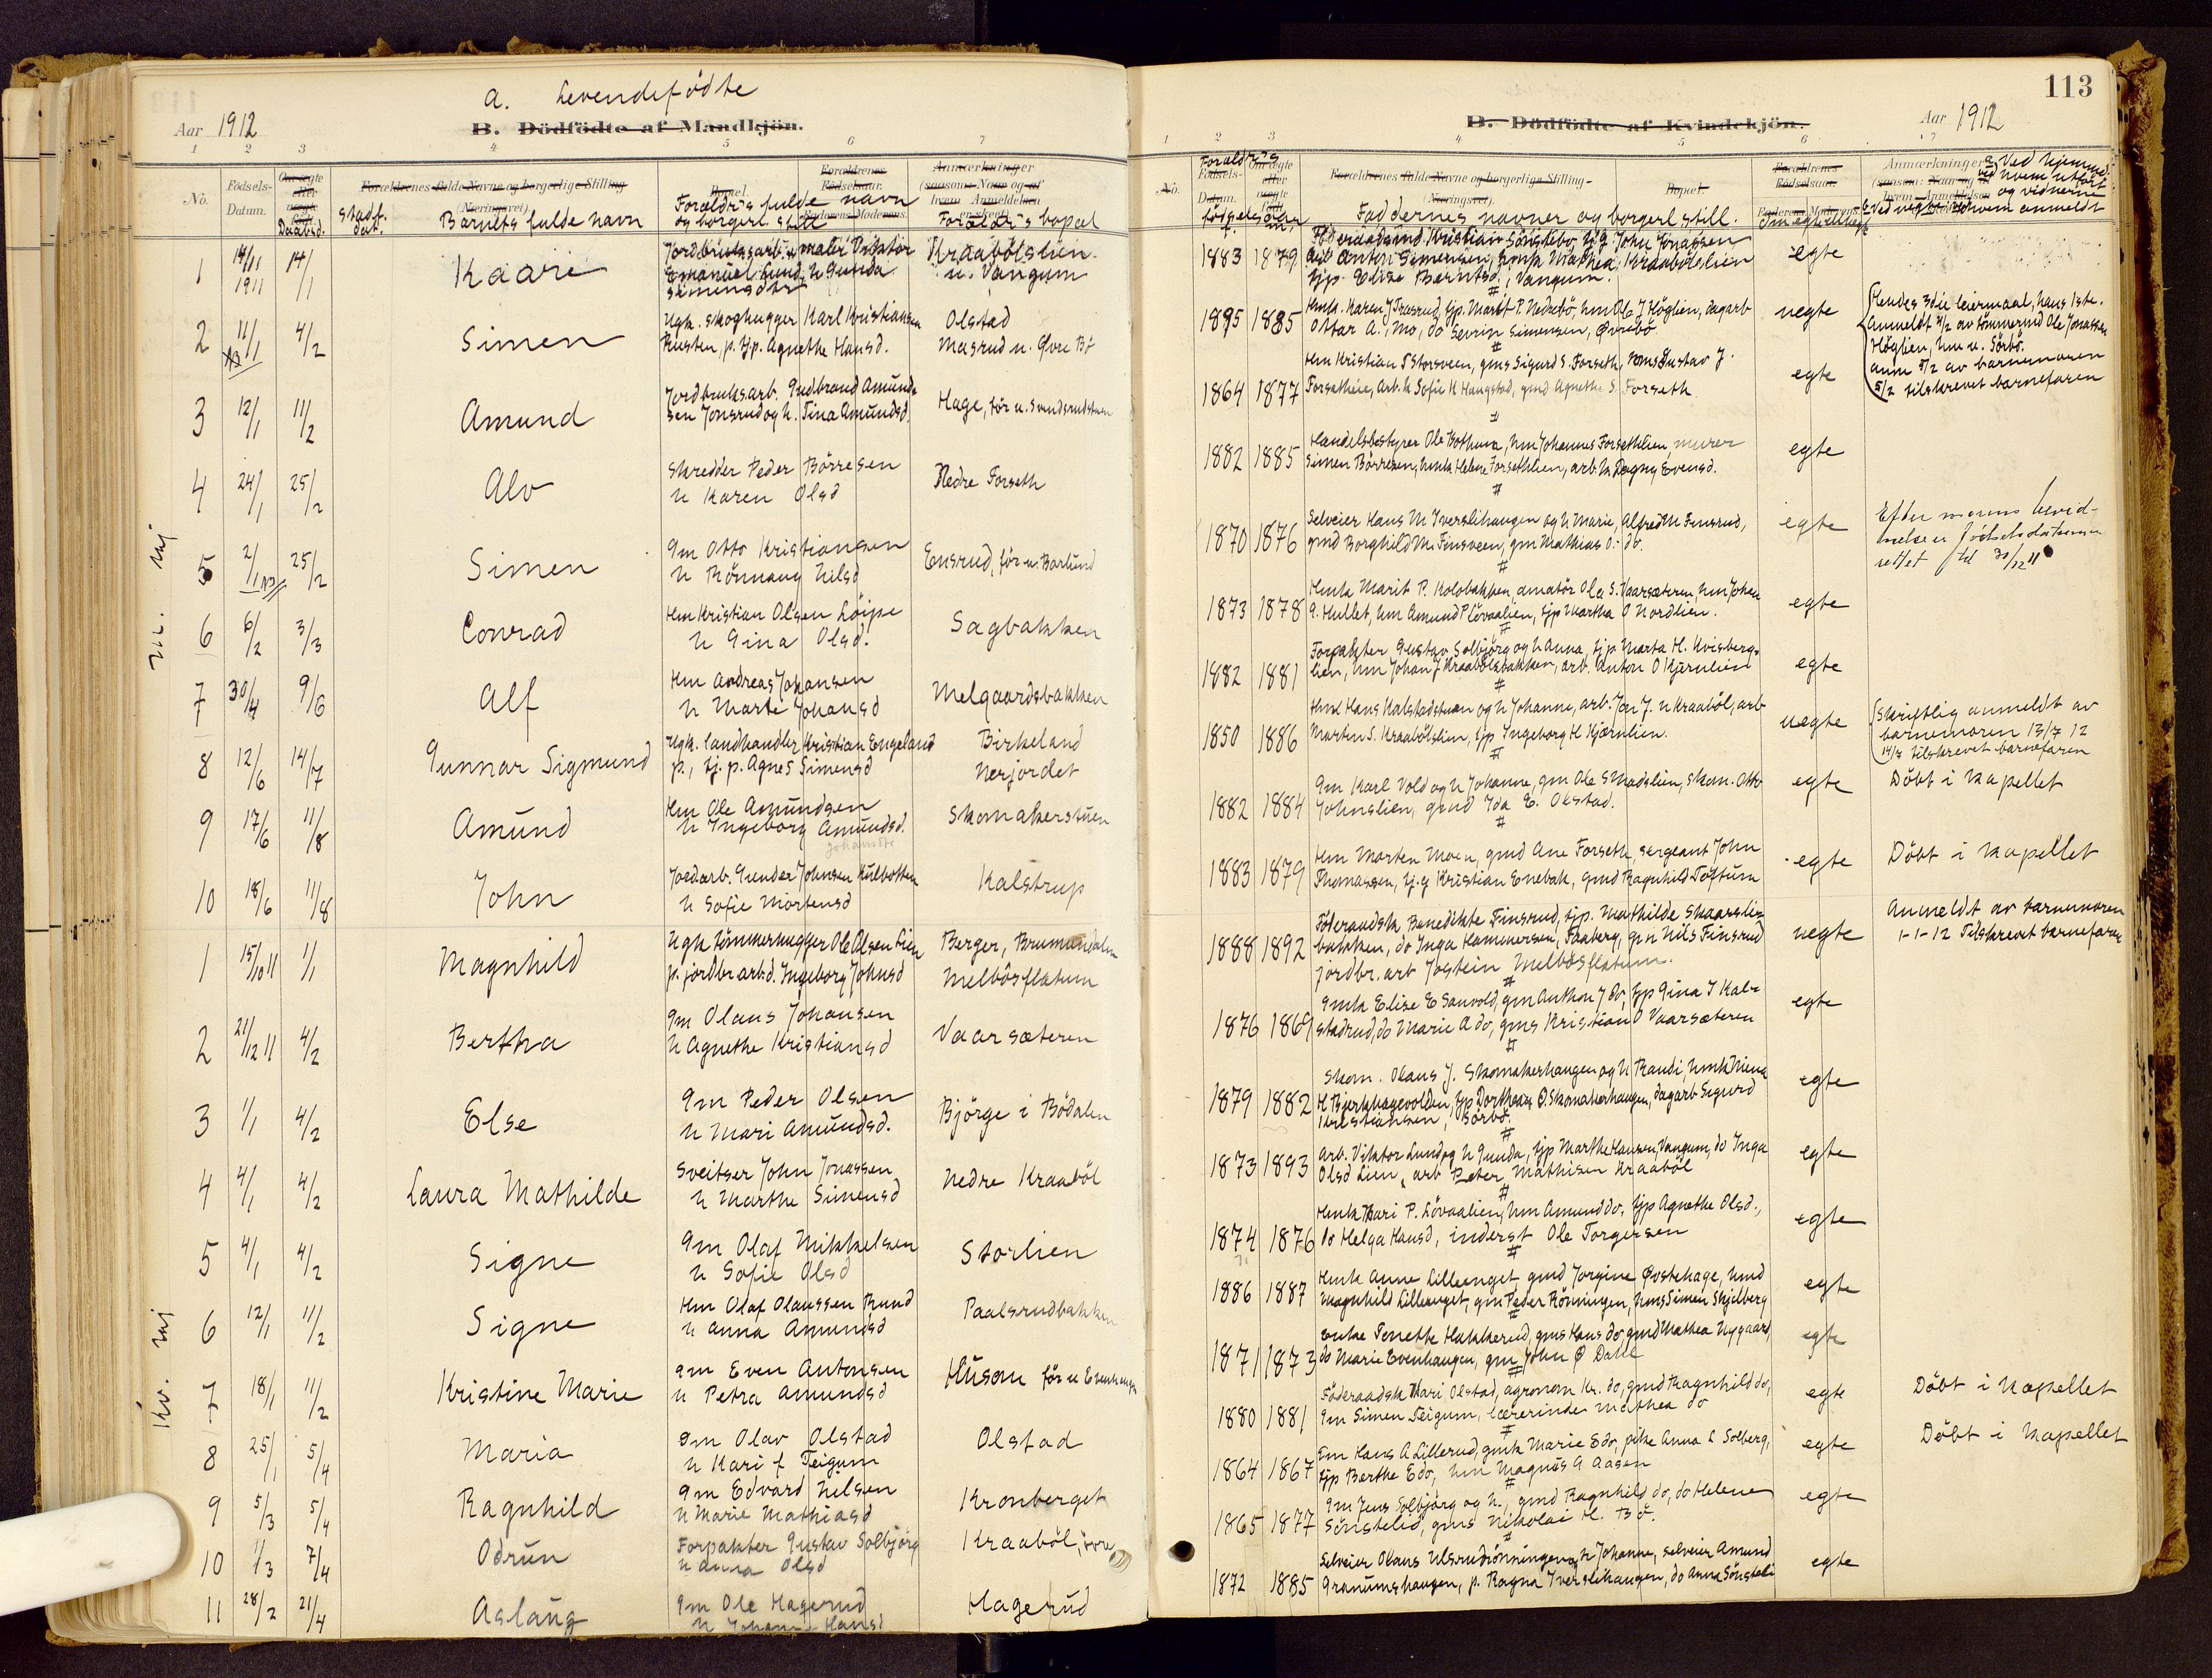 SAH, Vestre Gausdal prestekontor, Ministerialbok nr. 1, 1887-1914, s. 113